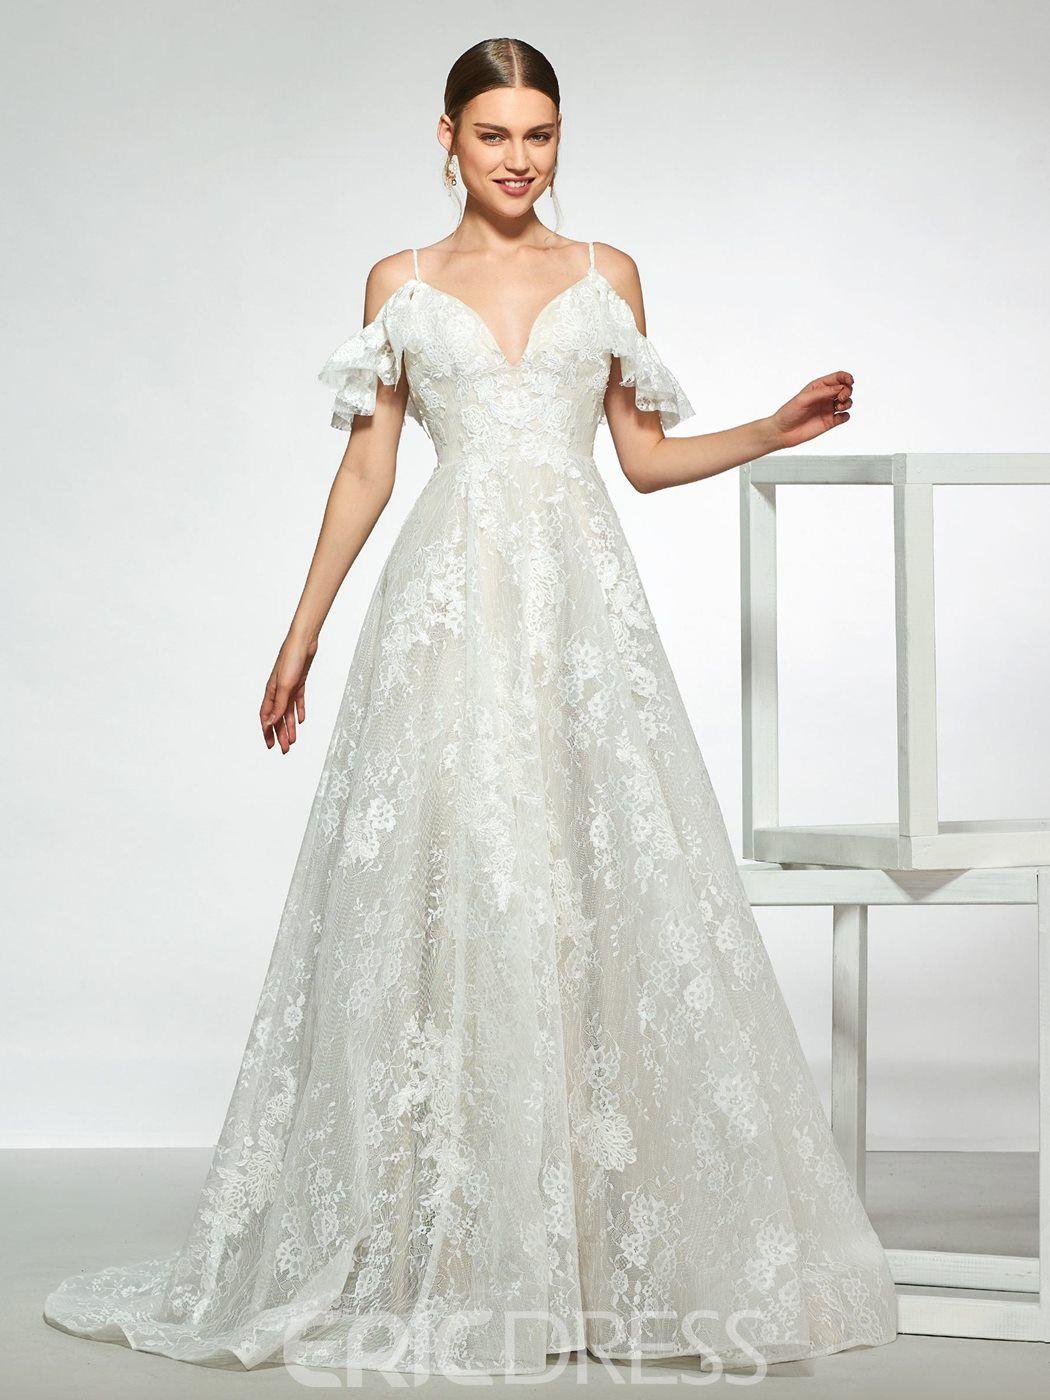 Spaghetti Straps Lace Cold Shoulder Wedding Dress Simple